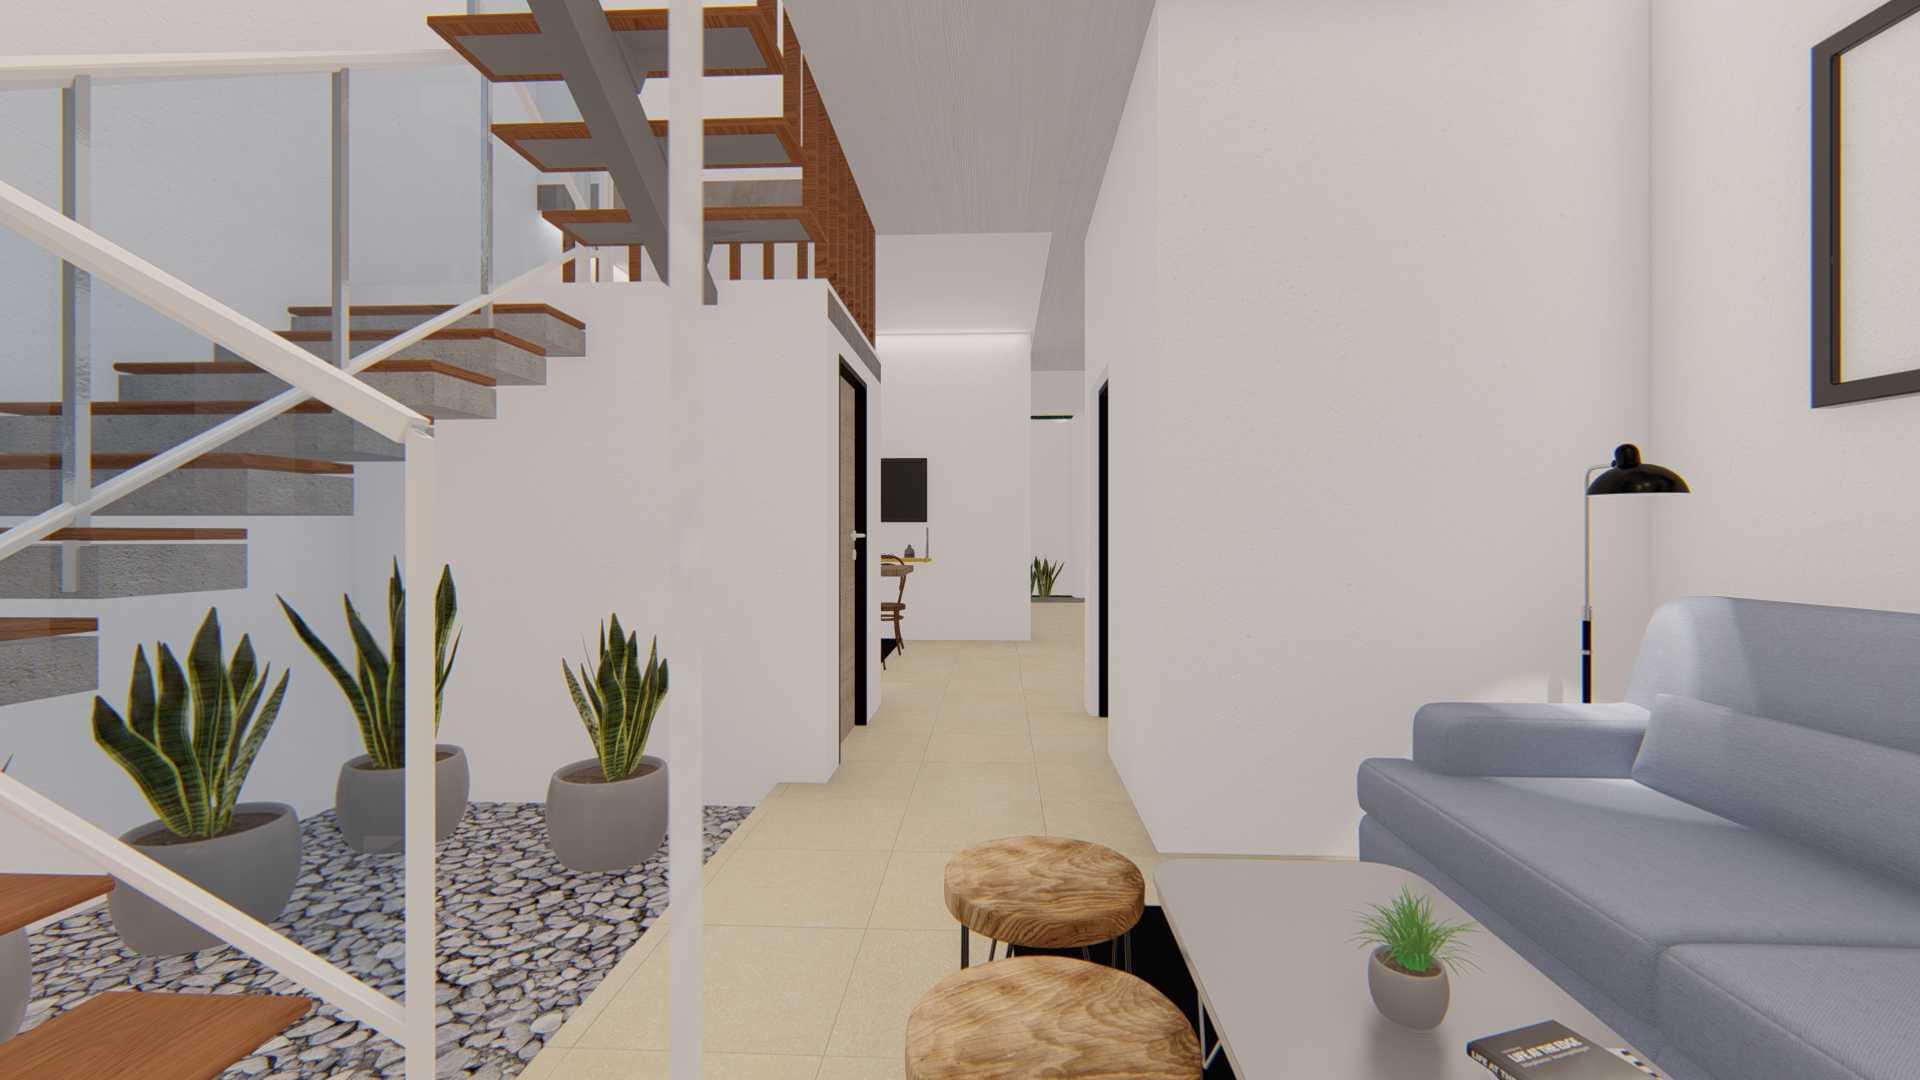 Suba-Arch Minimalist Modern Style House Kota Tgr. Sel., Kota Tangerang Selatan, Banten, Indonesia Kota Tgr. Sel., Kota Tangerang Selatan, Banten, Indonesia Suba-Arch-Minimalist-Modern-Style-House Minimalist 81020